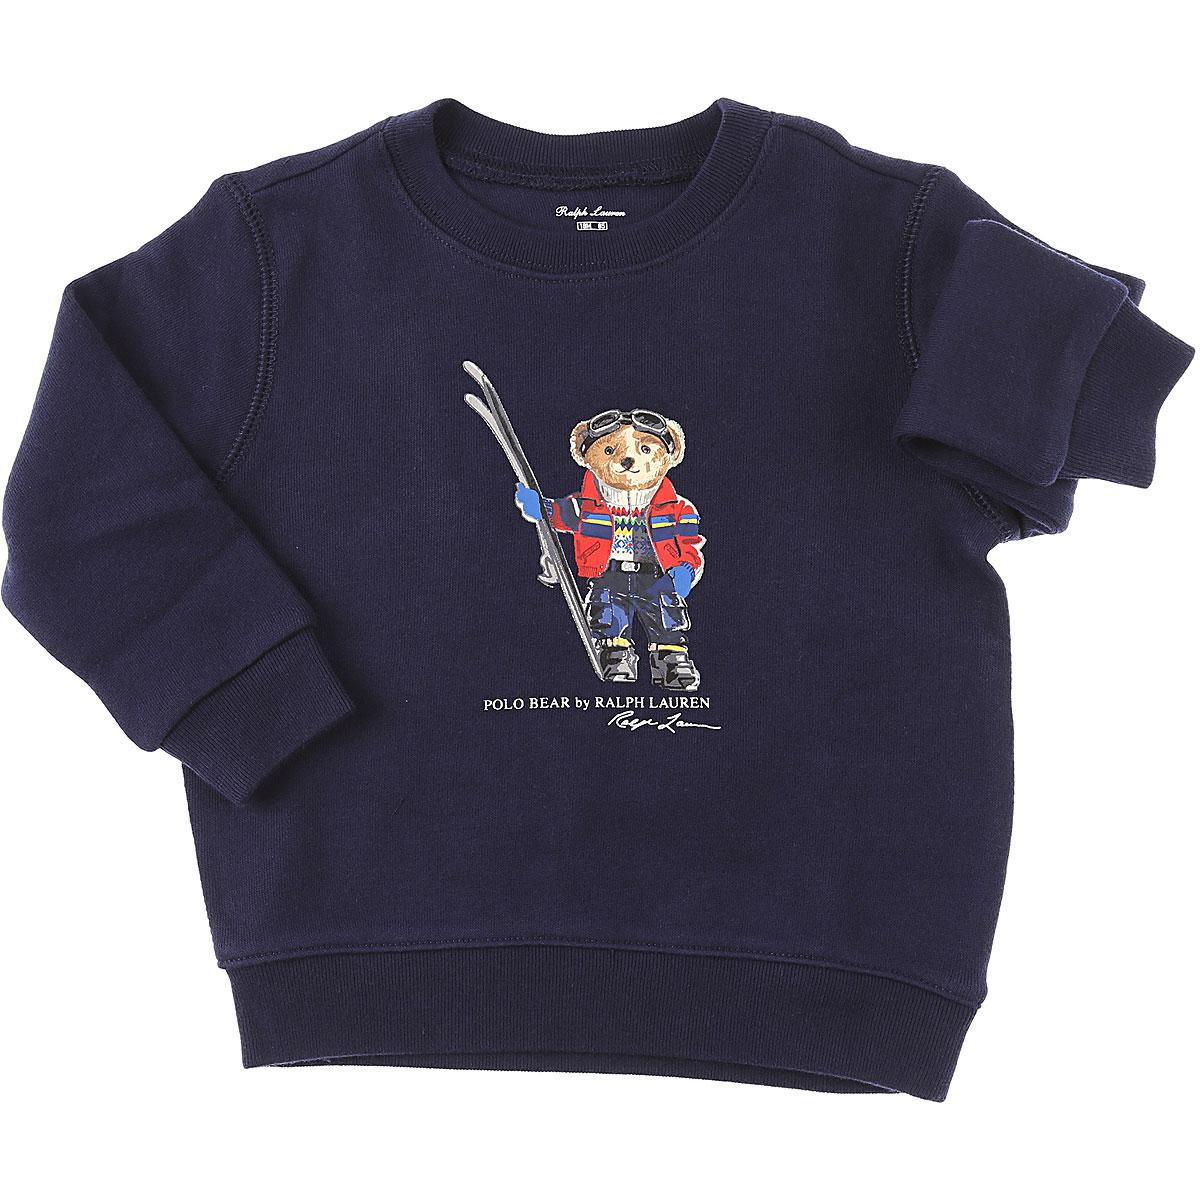 Ralph Lauren Baby Sweatshirts & Hoodies for Boys On Sale, navy, Cotton, 2019, 12 M 18M 2Y 3M 9M